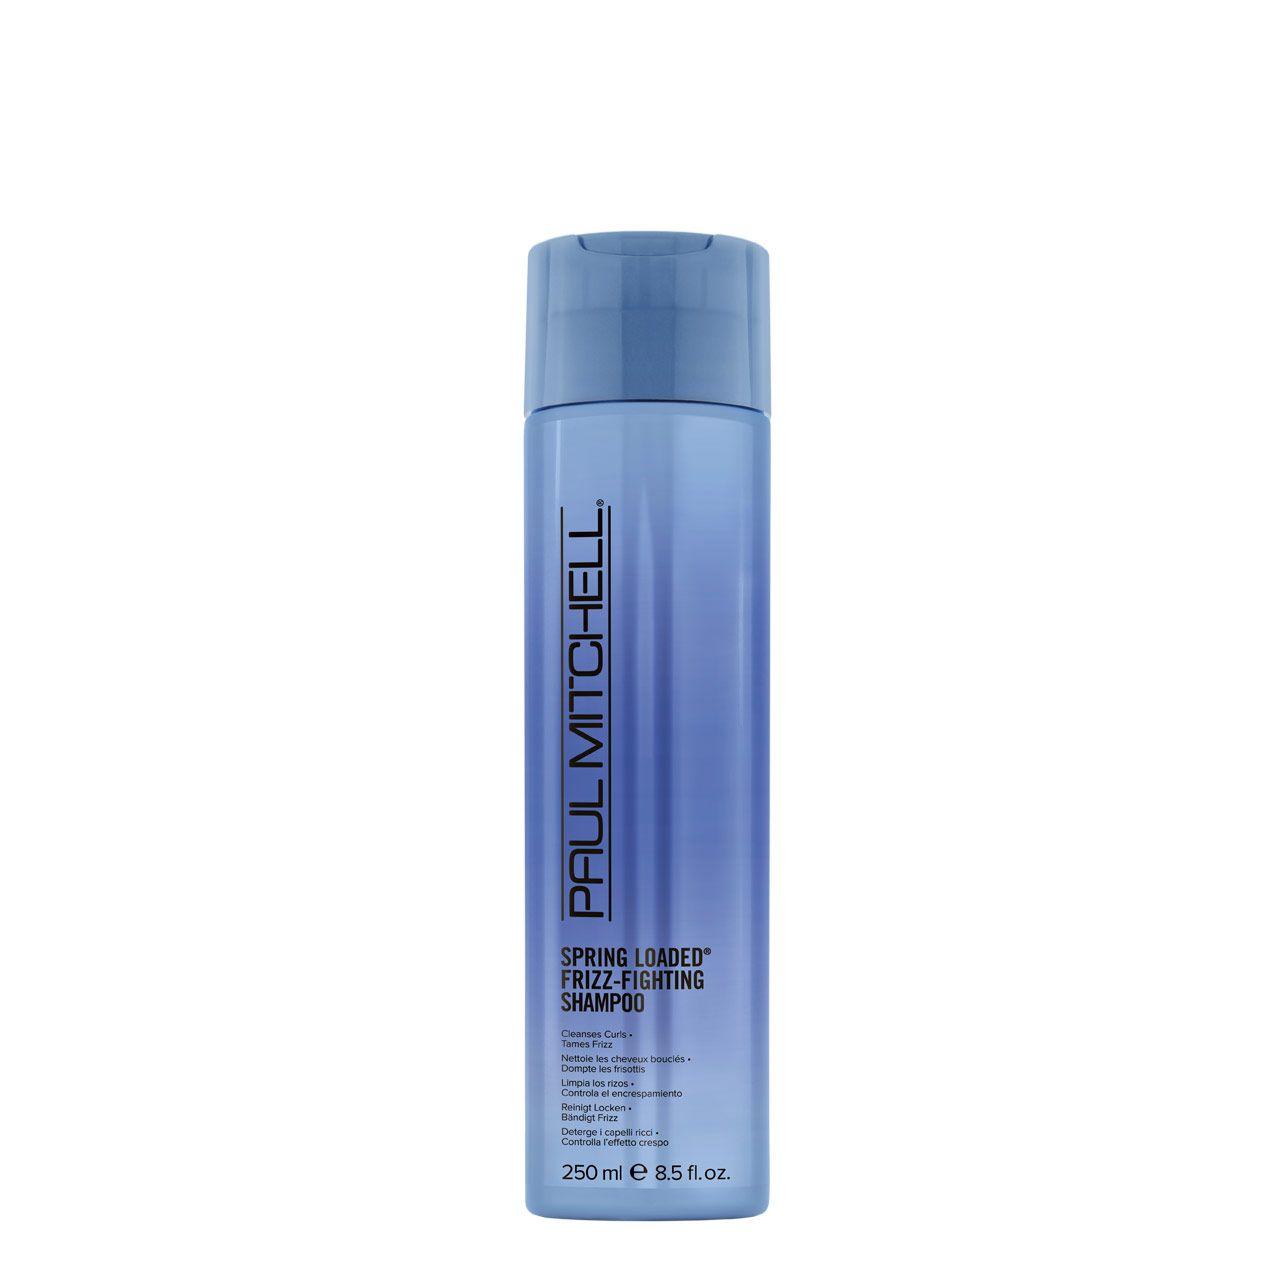 Paul Mitchell Curls Spring Loaded Frizz-fighting Shampoo - 250ml